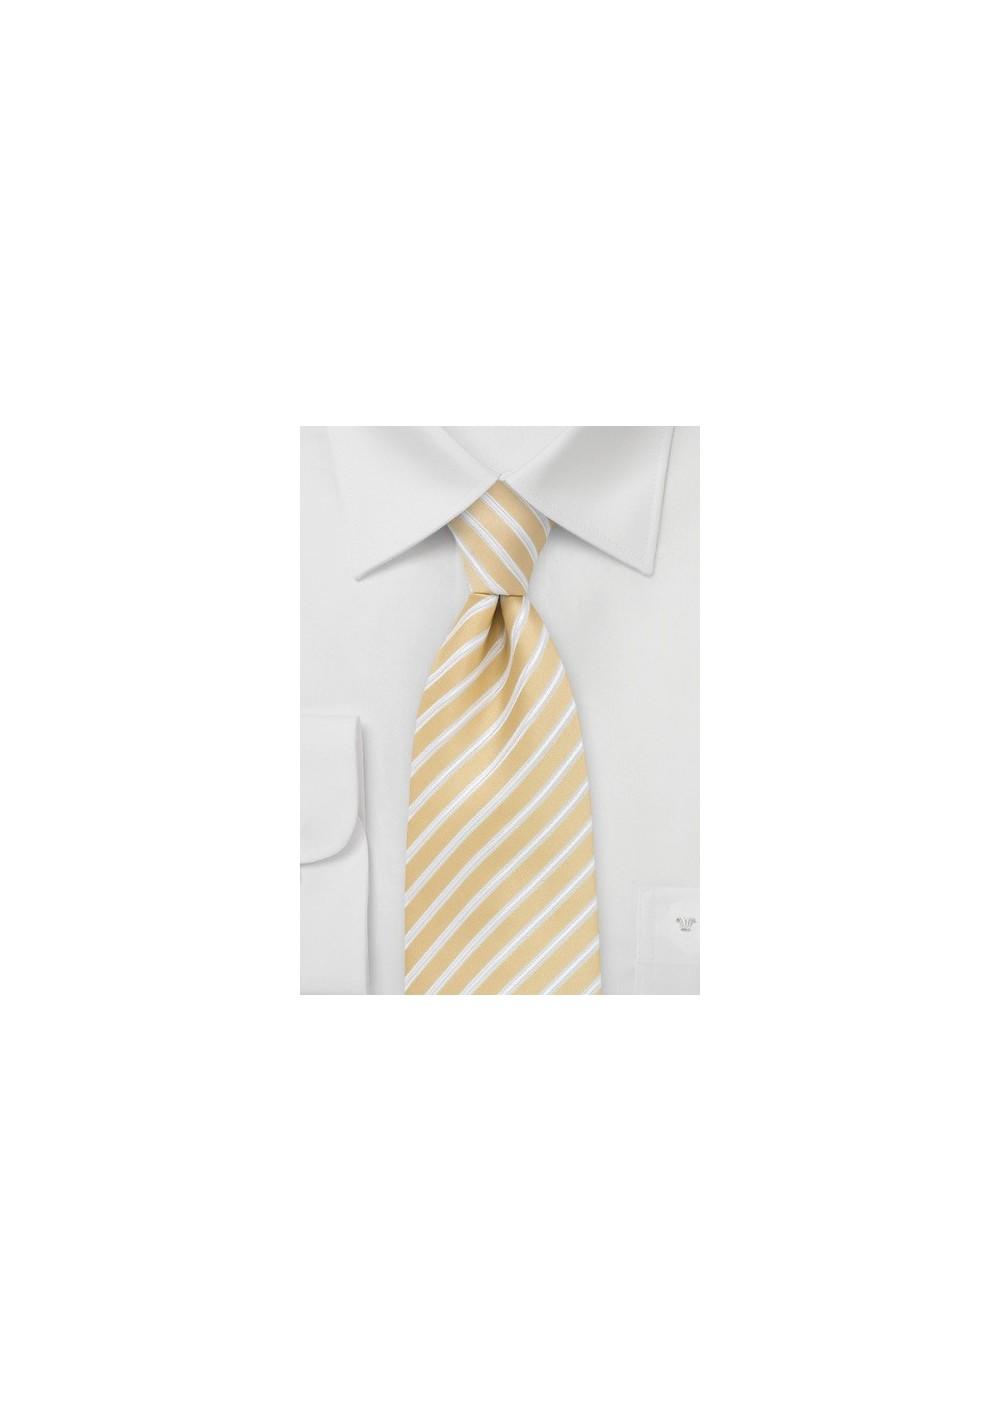 Harvest Yellow Striped Tie